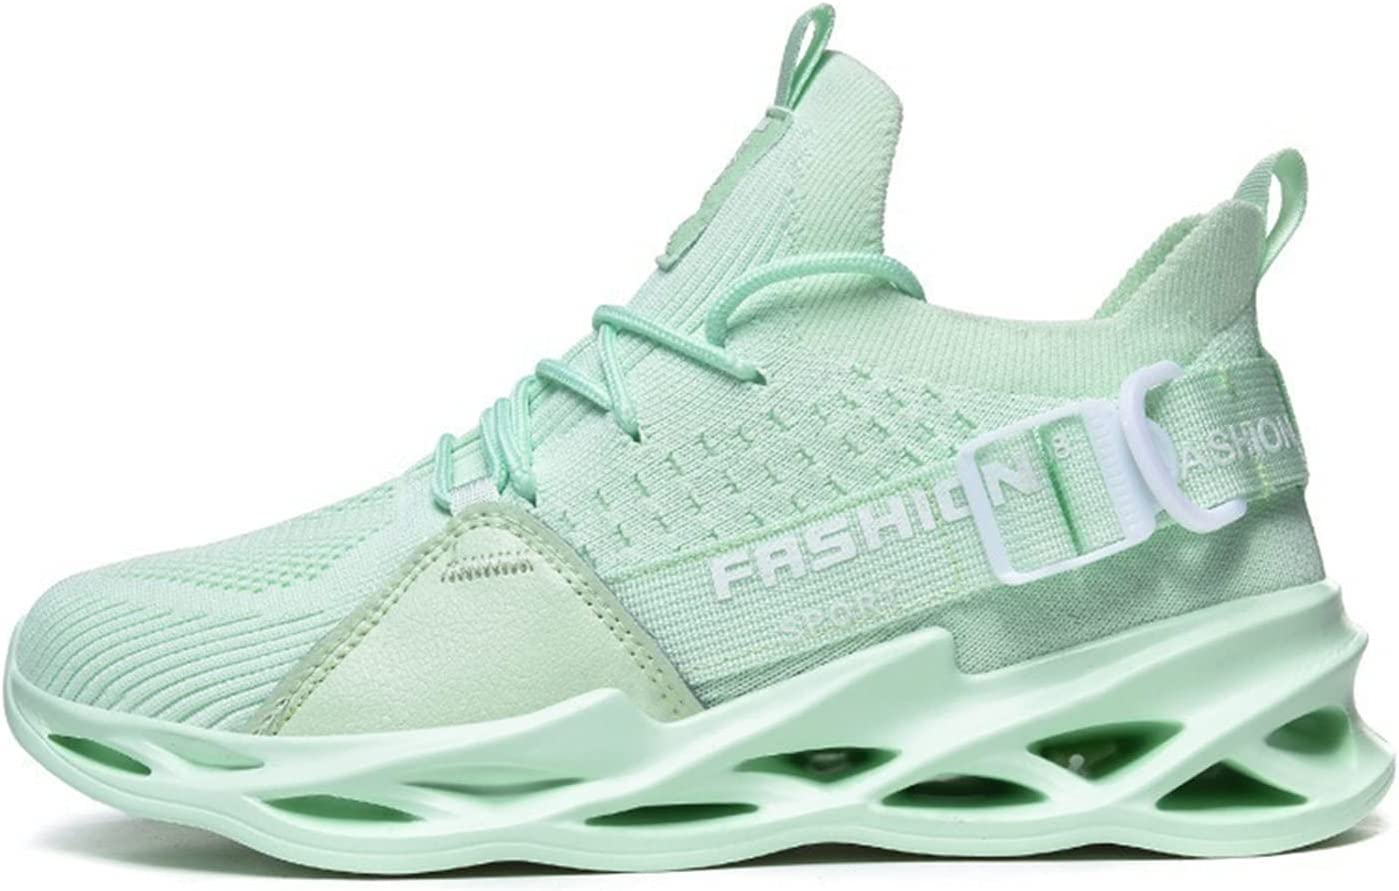 Special sale item XLDQJPN Men's A surprise price is realized Streetwear Sneakers Hip Color : hop Gree